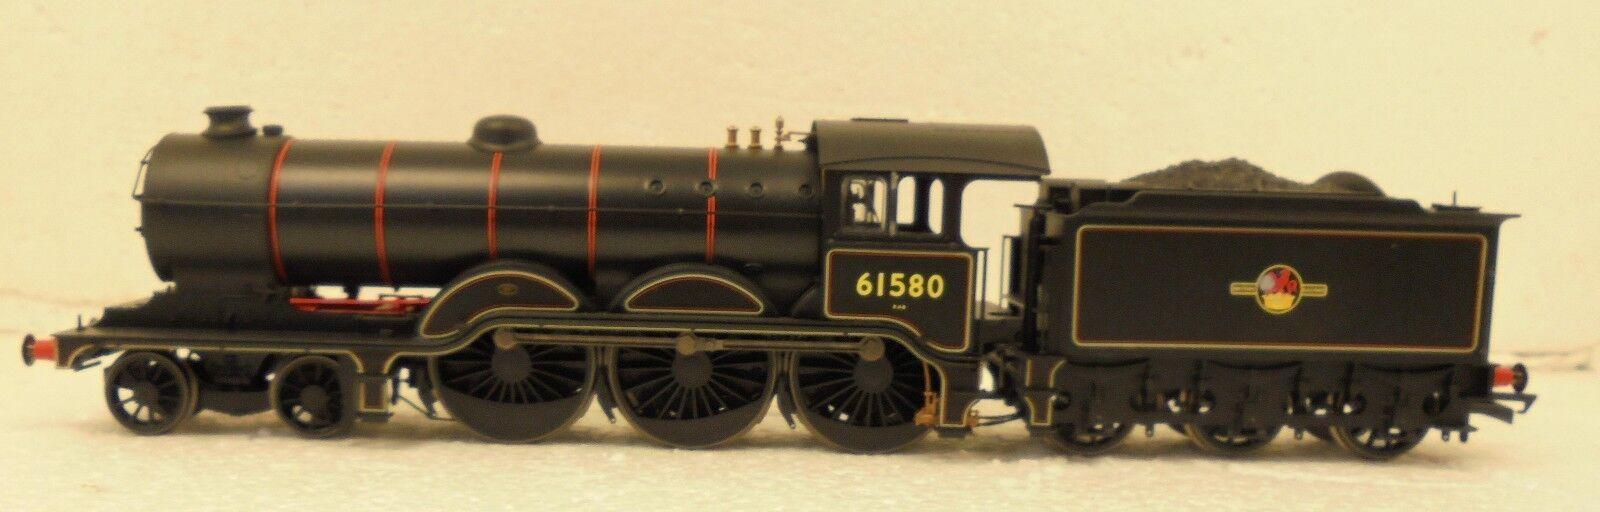 Hornby R3432 BR Late B12 classe Locomotive '61580'